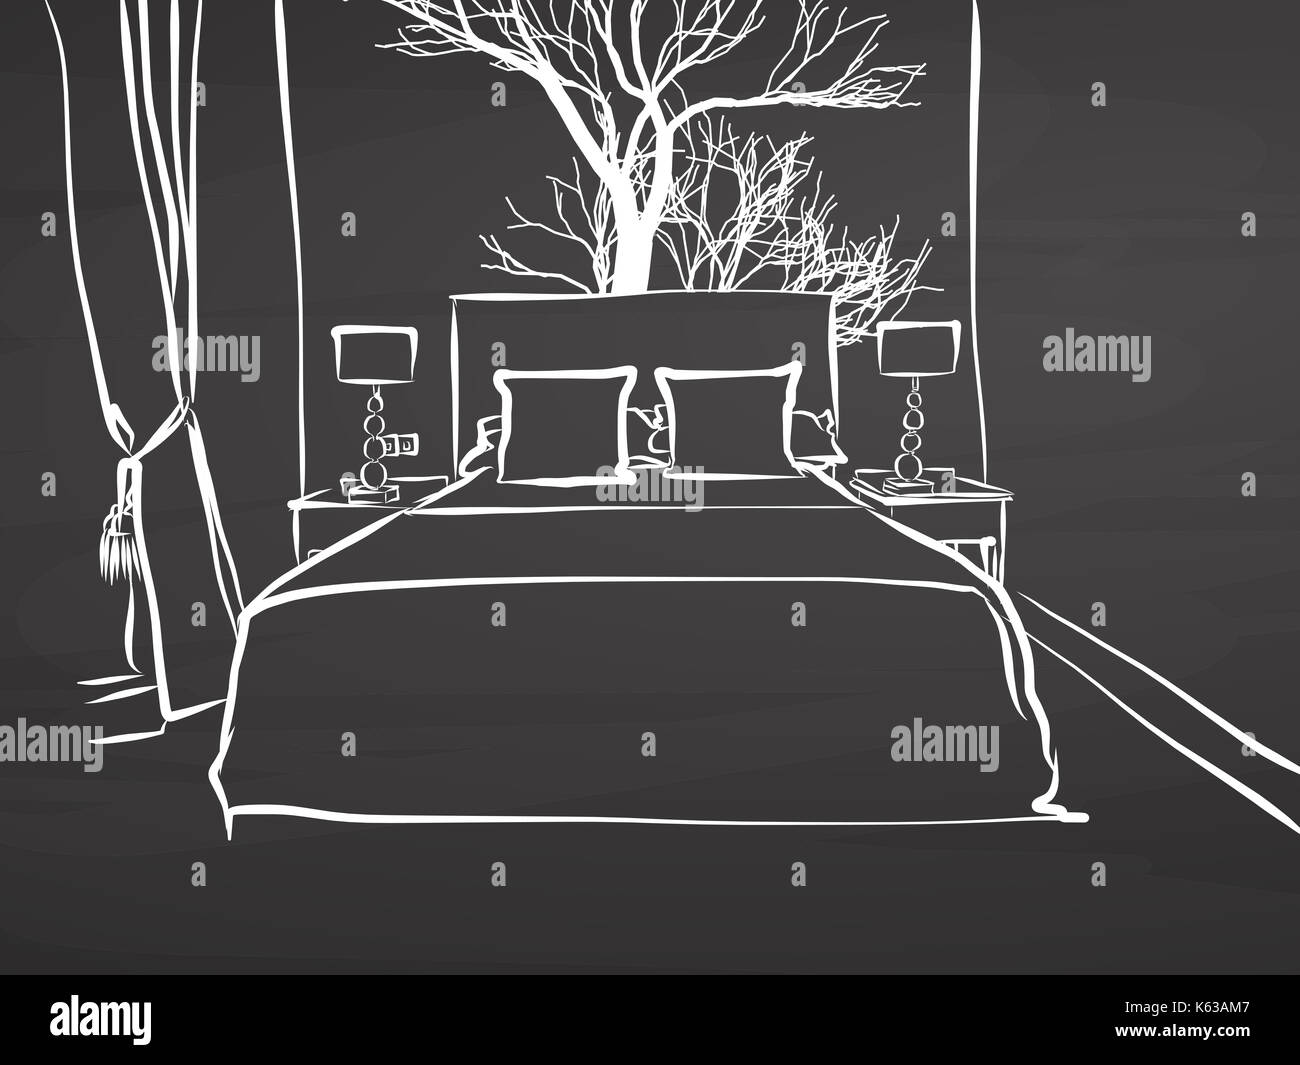 Skizziert Hotel Zimmer Am Schwarzen Brett Handdrawn Vektor Skizze